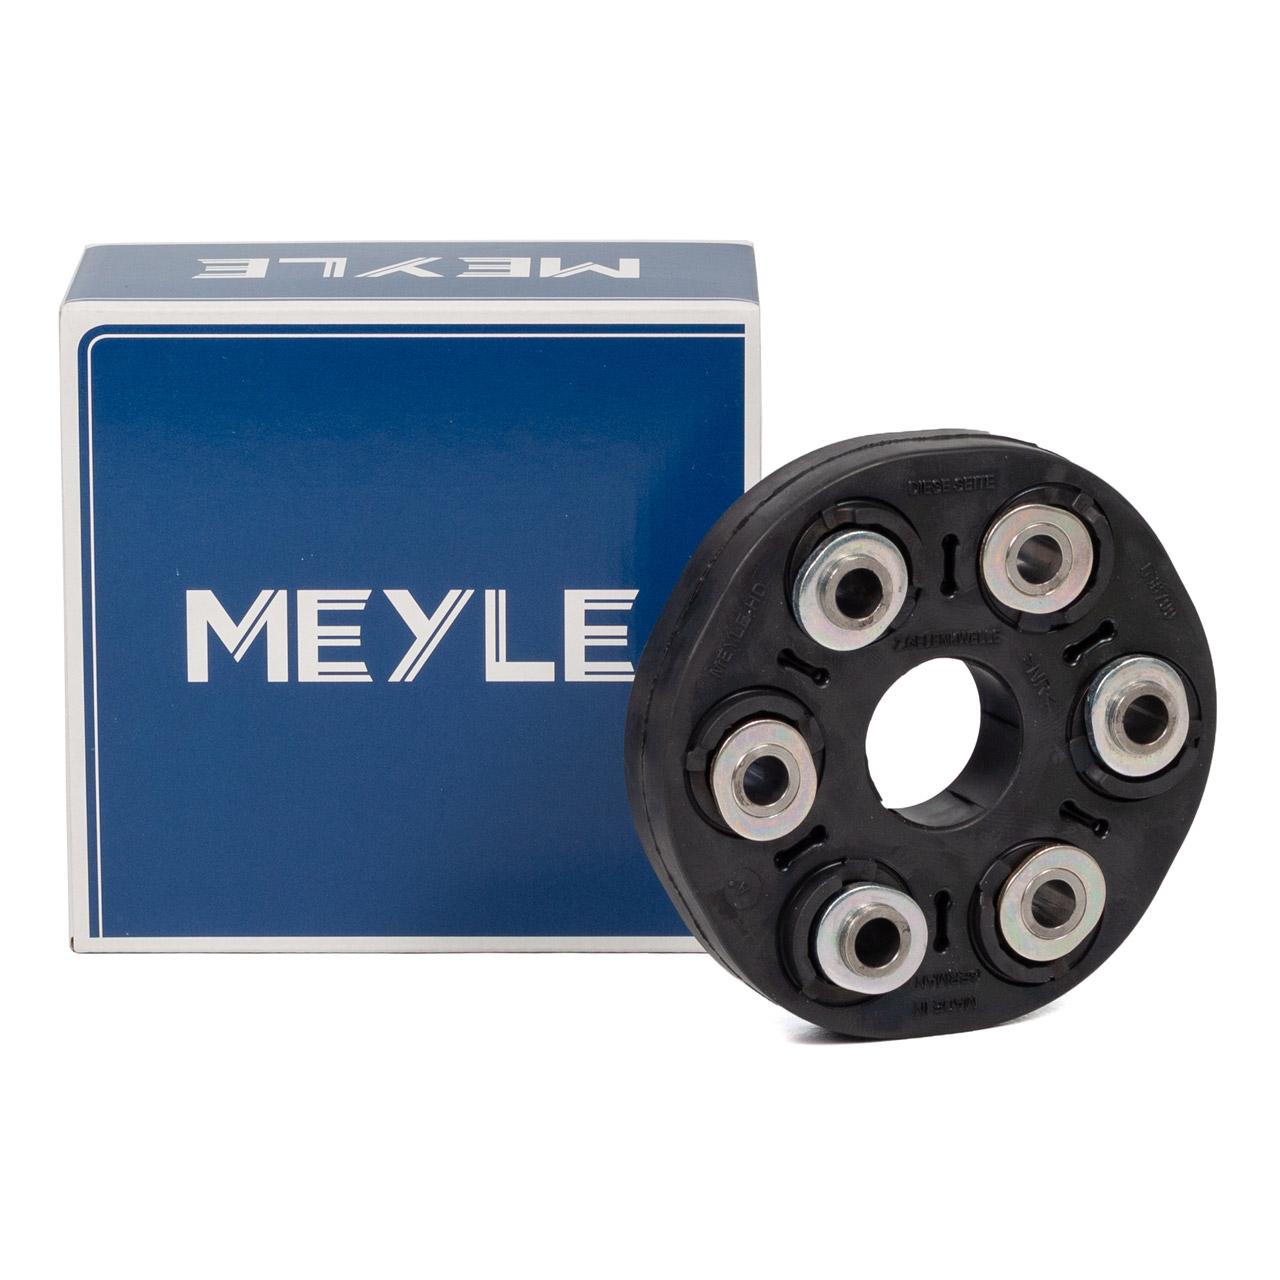 MEYLE HD Gelenkscheibe Hardyscheibe MERCEDES W202 W210 W124 W140 W220 C208 A208 1244110515